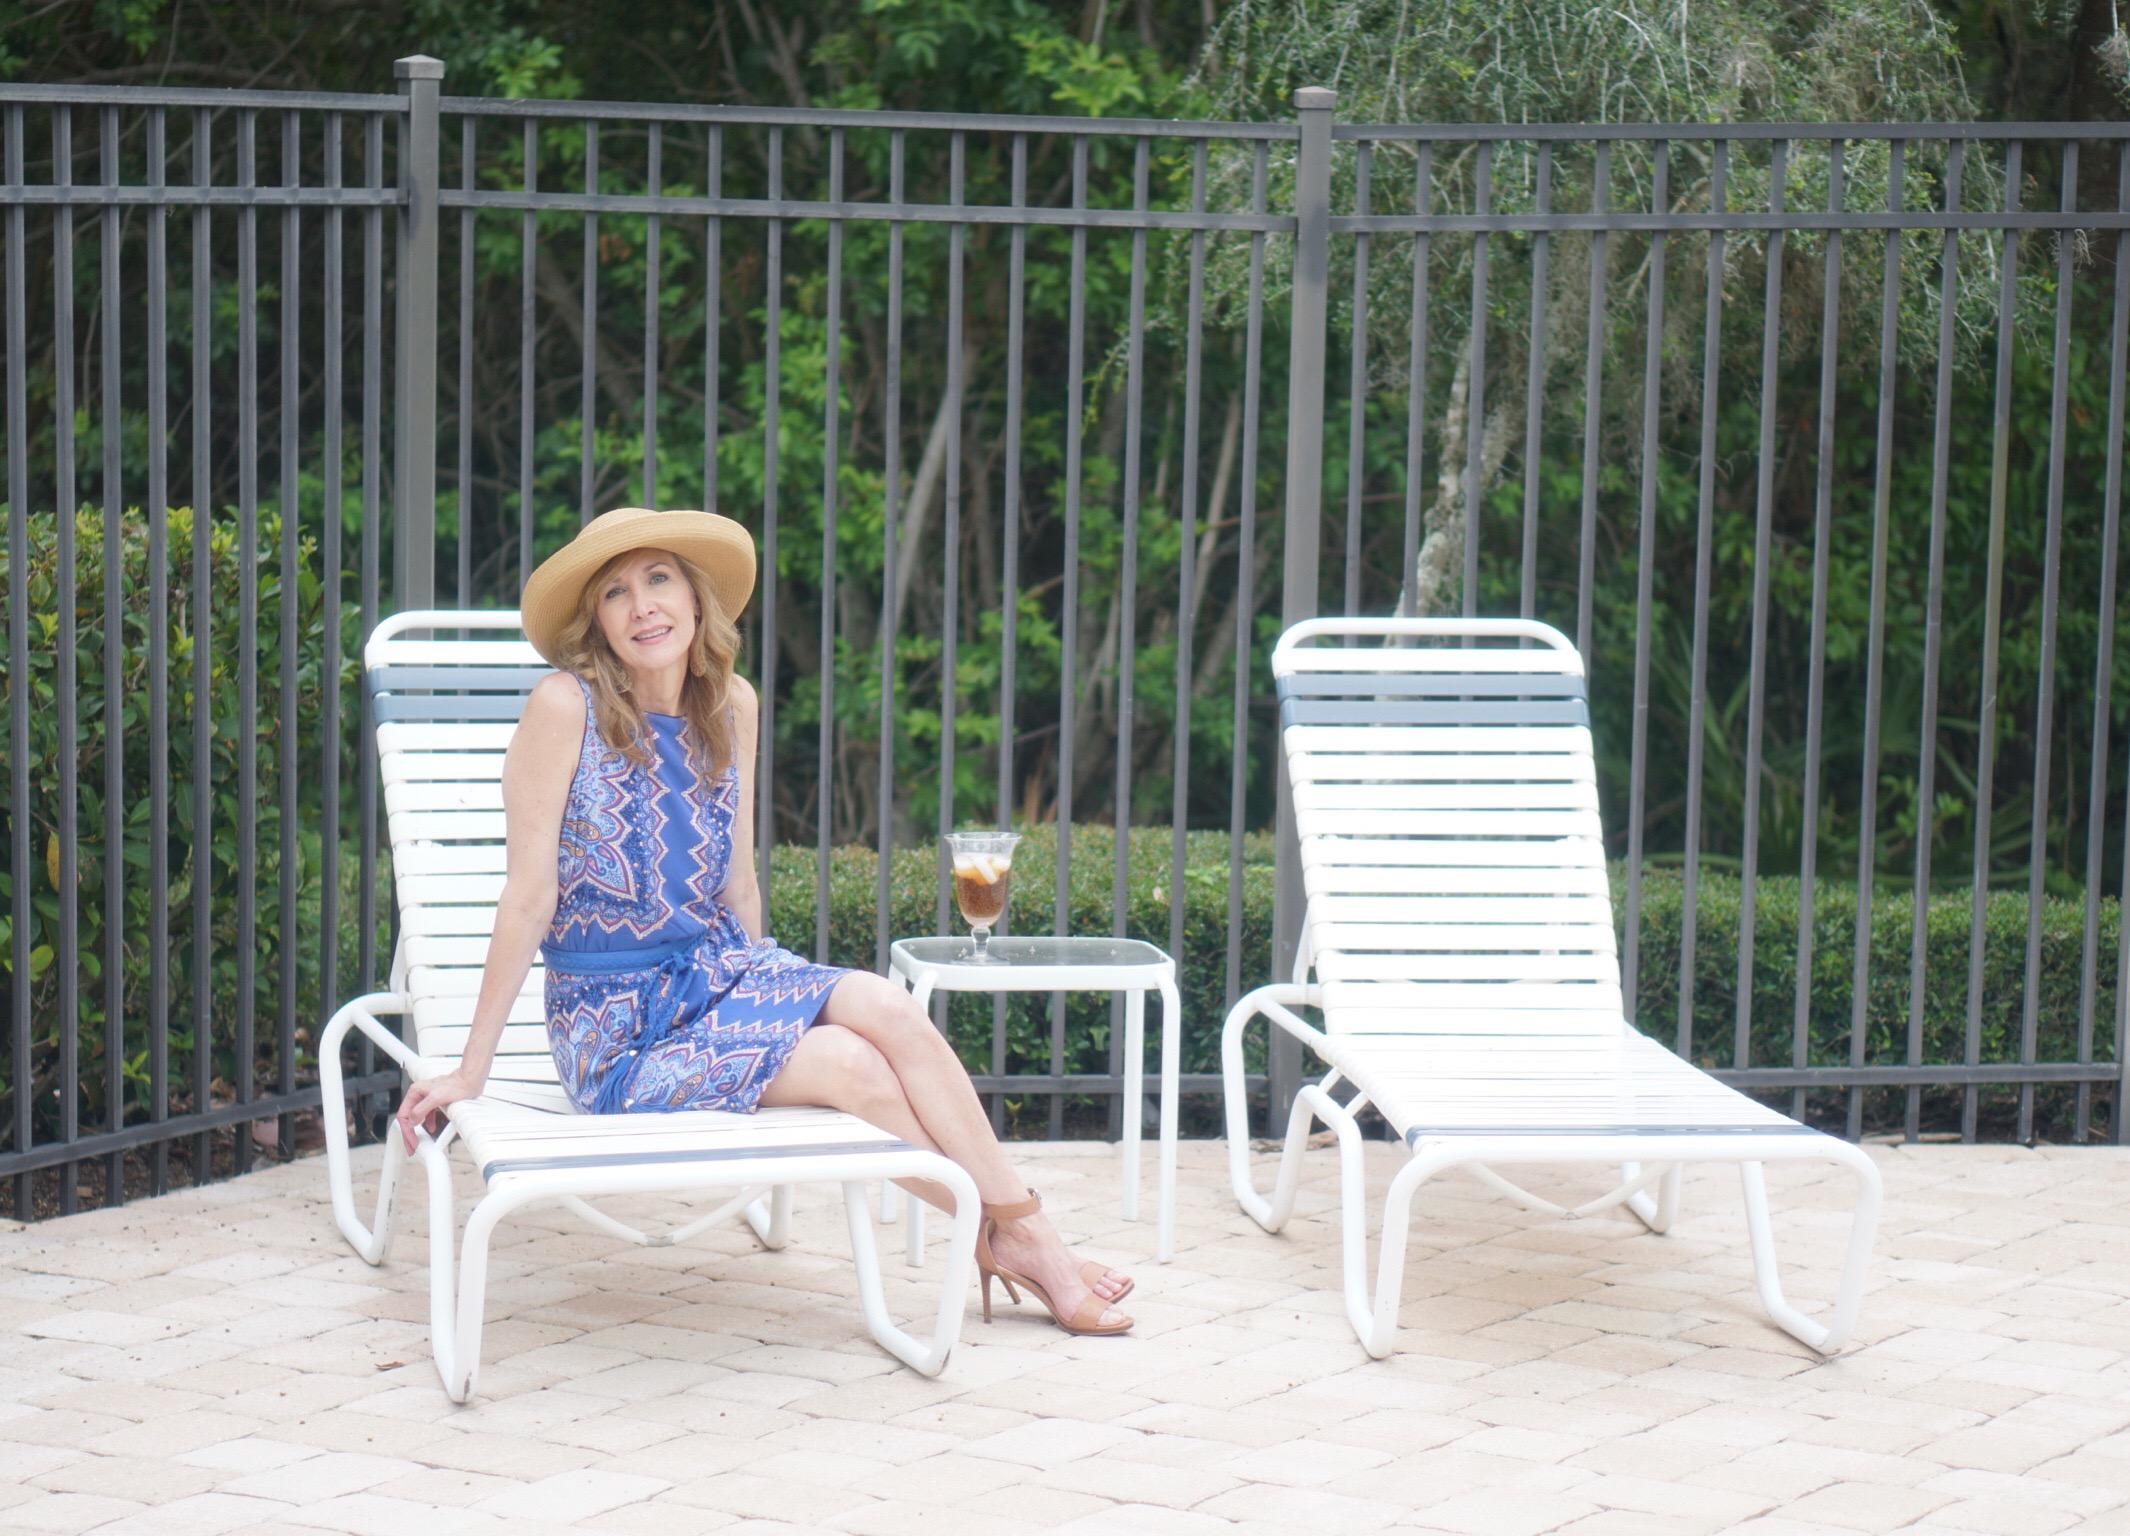 J.Jill summer essentials, a blue mosaic dress is great poolside